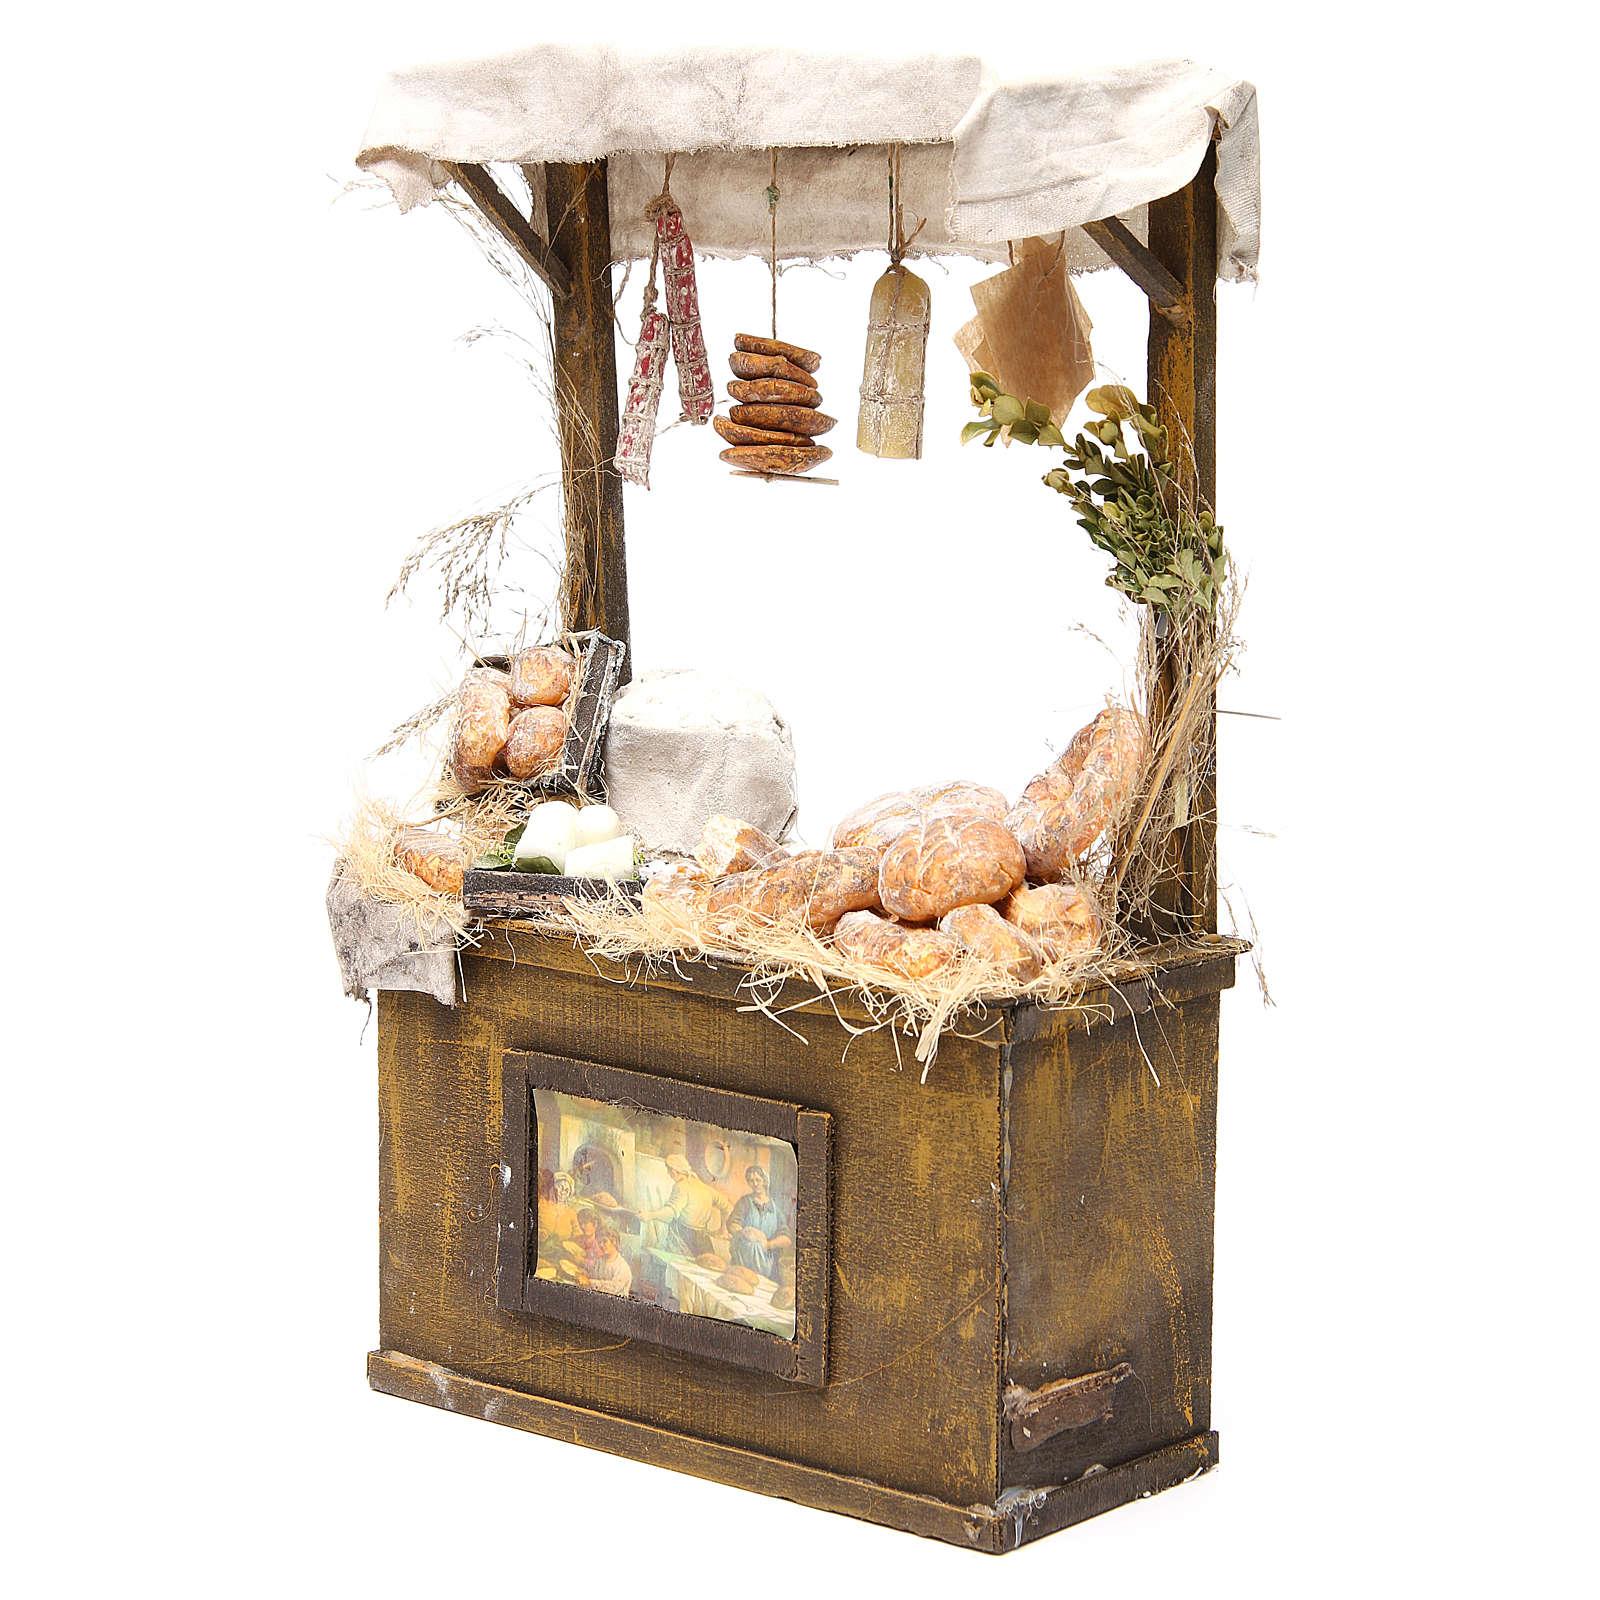 Nativity baker's stall in wax, 40x25x10.5cm 4